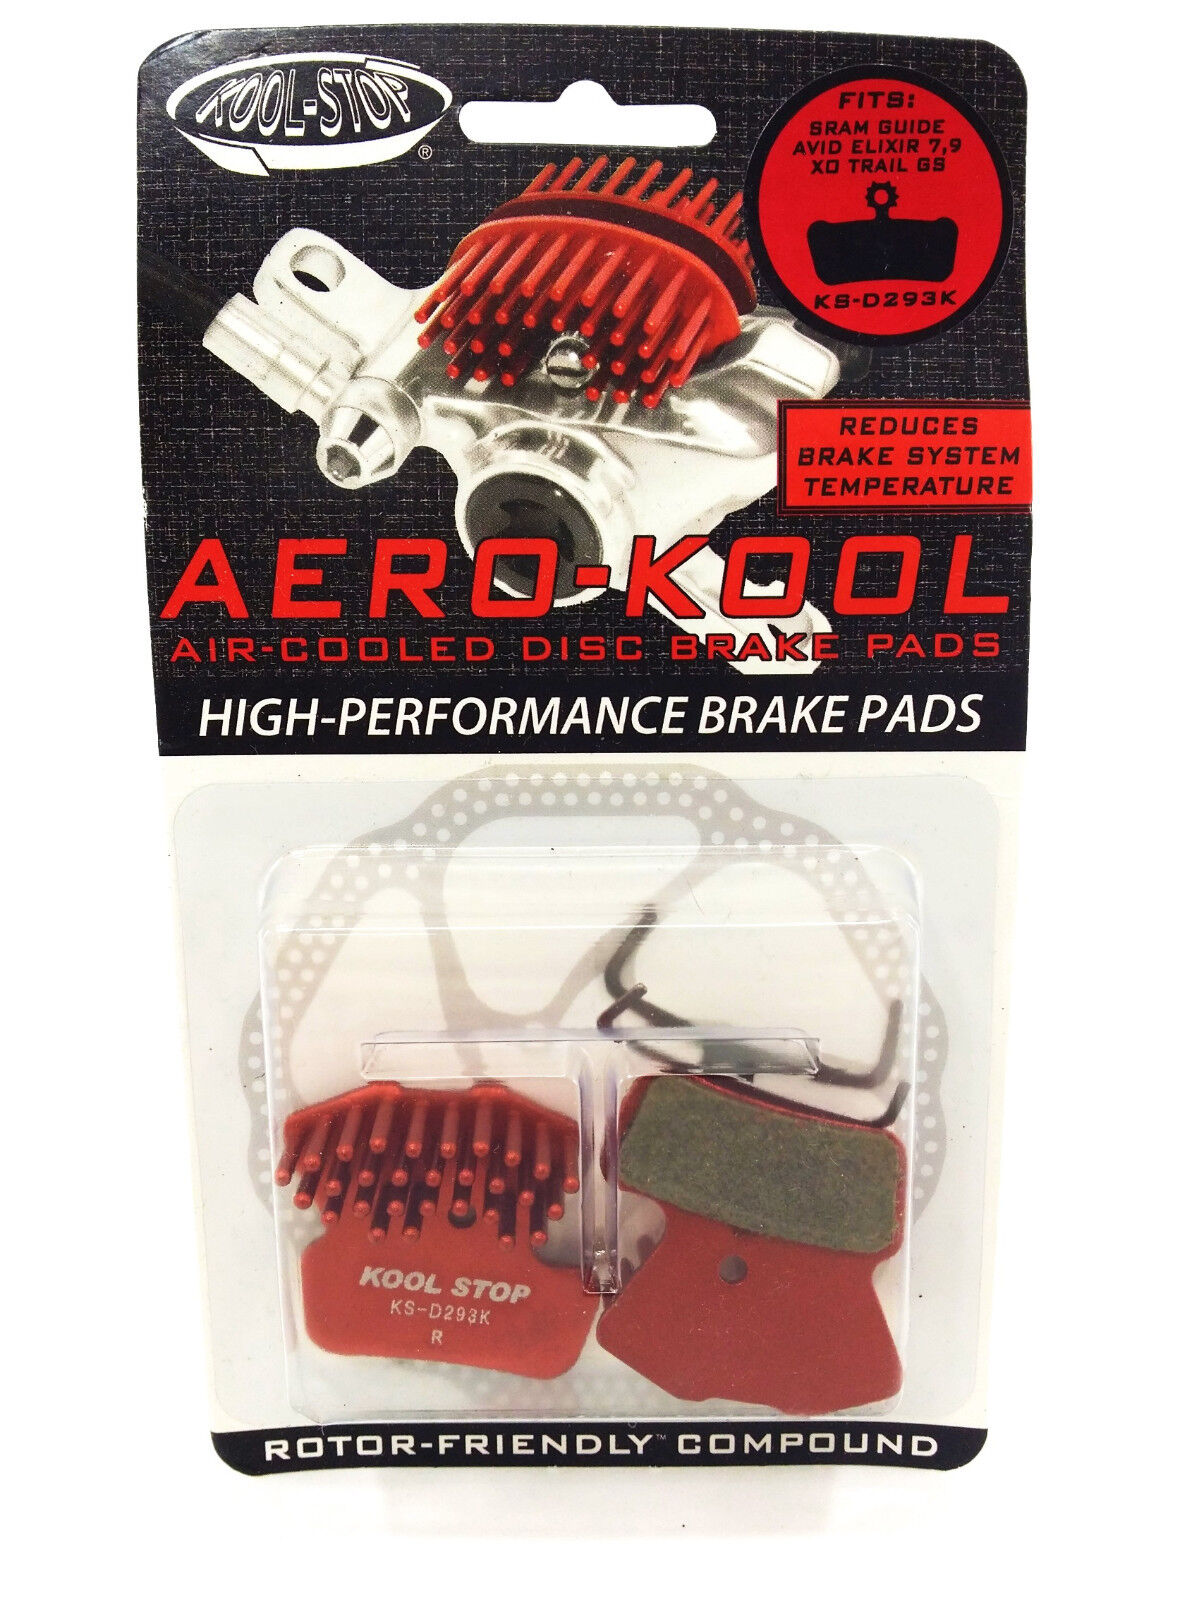 NEW Kool-Stop Aero-Kool Disc Brake Pad Avid XO Trail SRAM Guide Avid Elixir 7 9